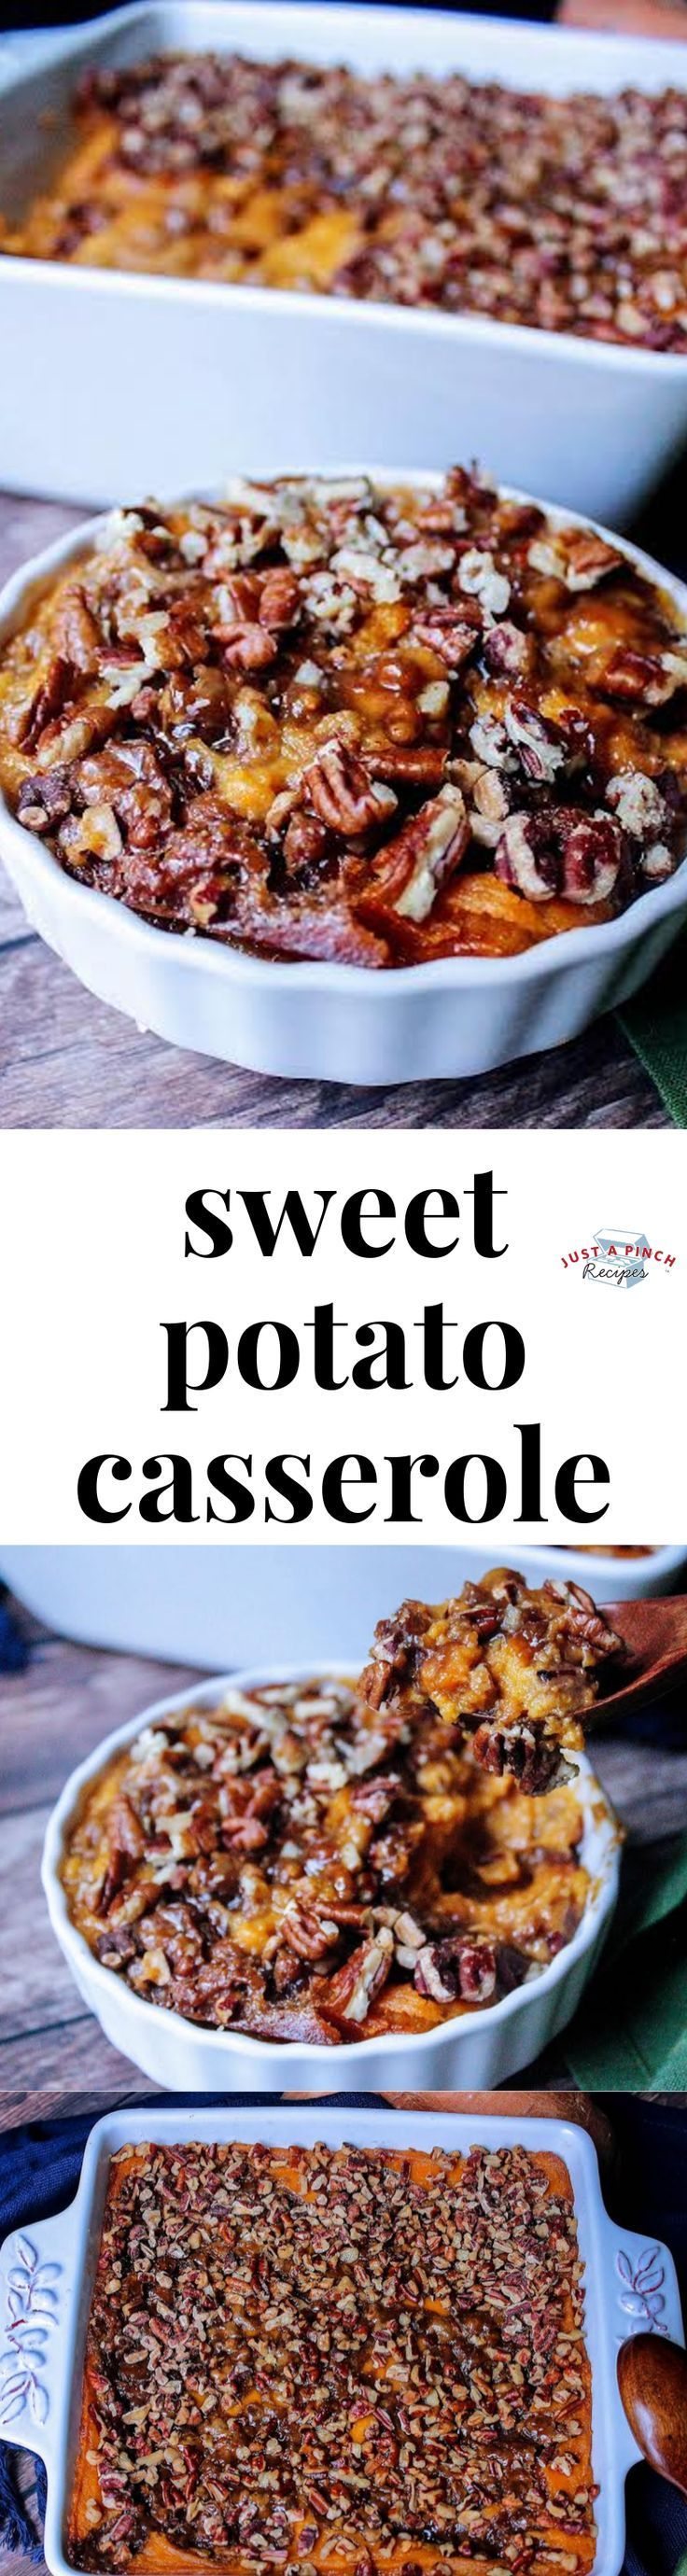 Sweet Potato Casserole - #casserole #potato #sweet - #New #thanksgivingrecipessidedishes